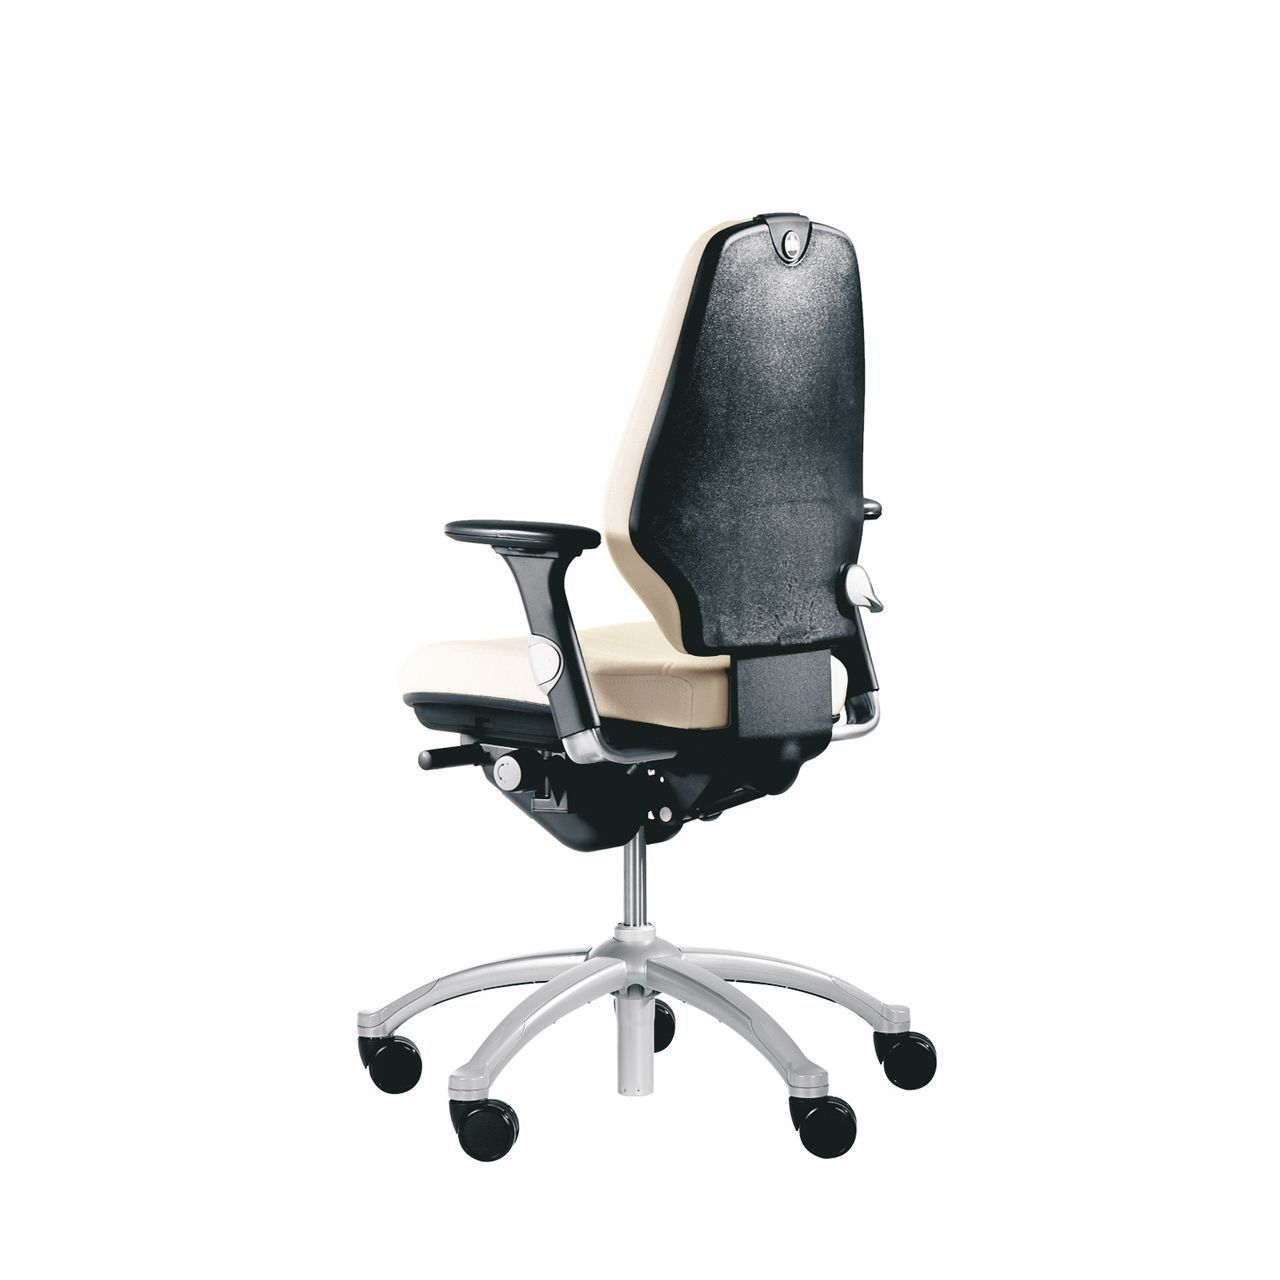 RH Logic 300 24 7 Bureaustoel